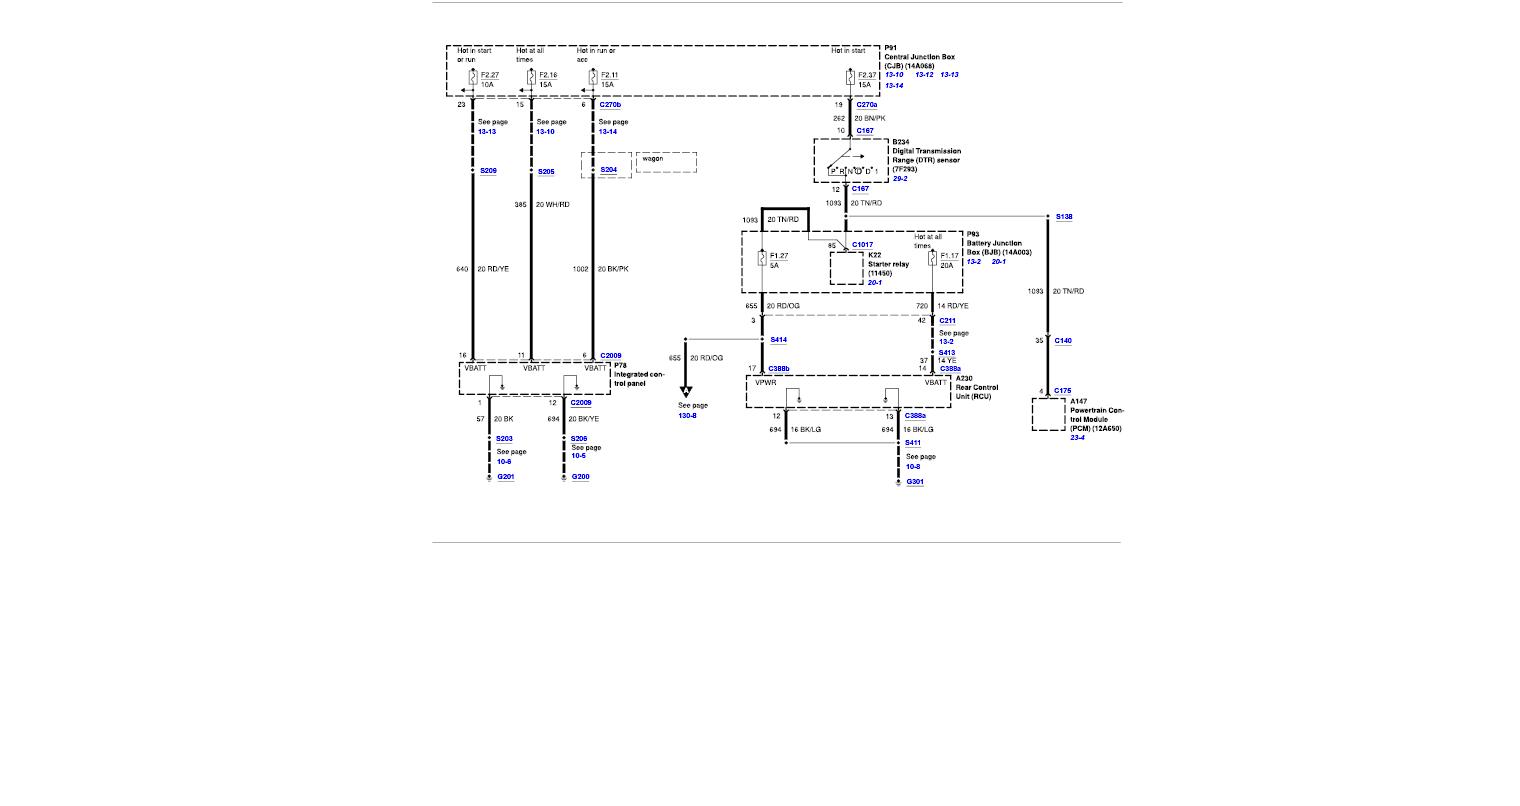 LO_3880] 1998 Mercury Tracer Wiring Diagram Free Picture Free Diagram | 1998 Mercury Tracer Wiring Diagram Free Picture |  | Elia Mimig Ymoon Rdona Hapolo Mohammedshrine Librar Wiring 101